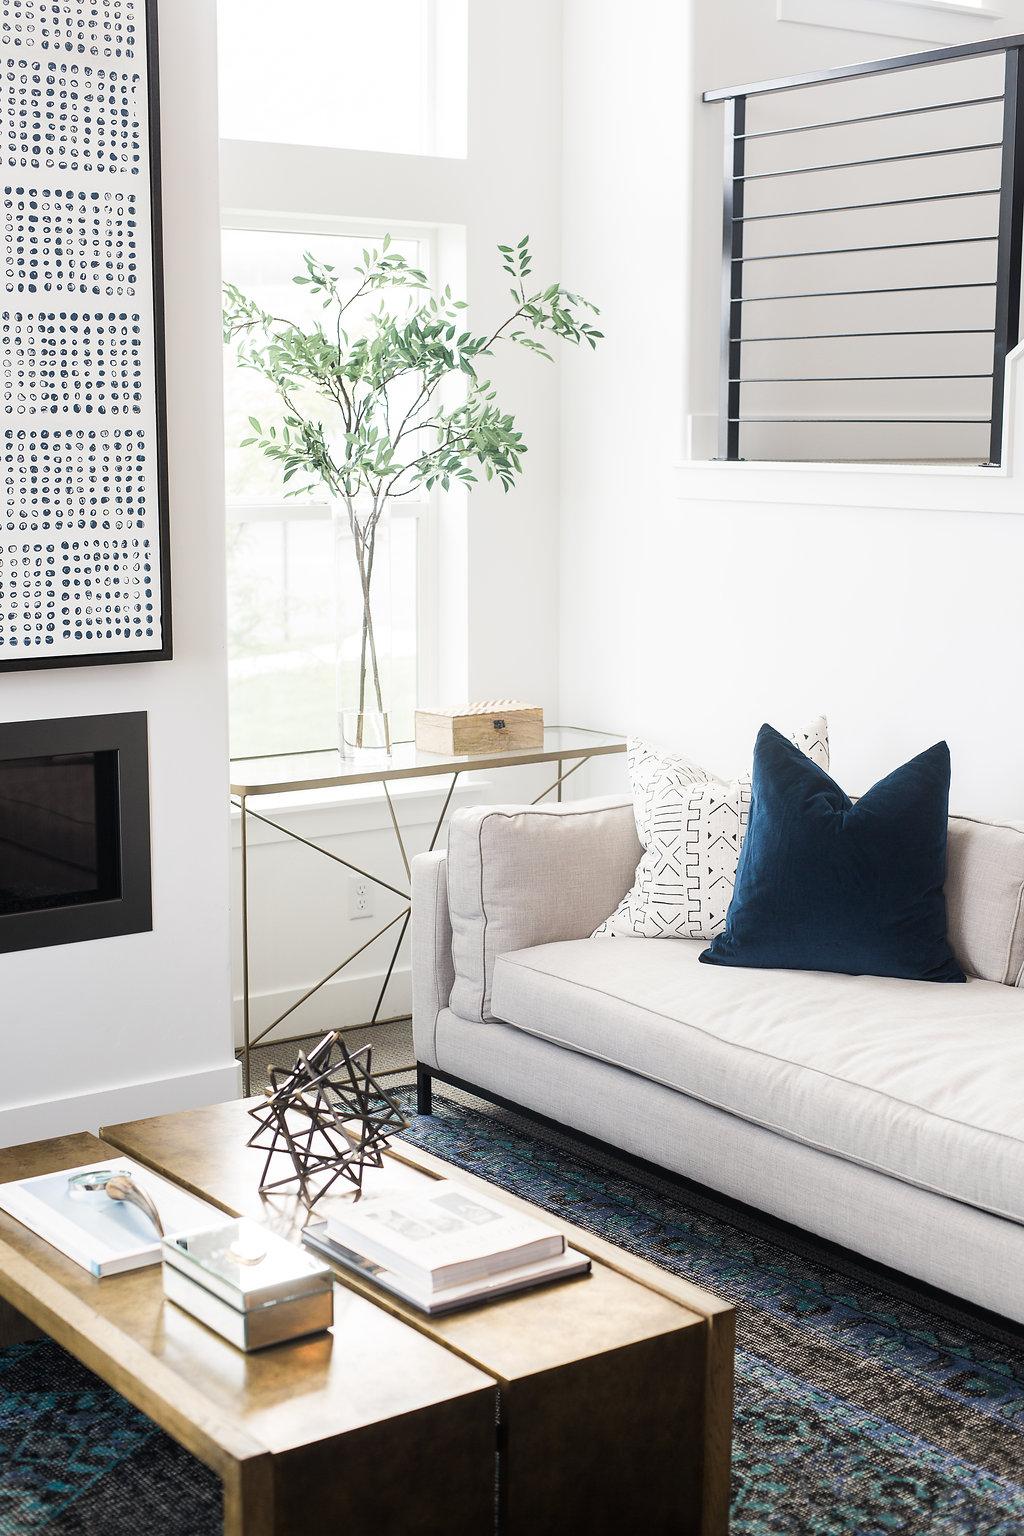 Akin Design Studio | Iron Horse Family Room - Fresh, collected, modern design